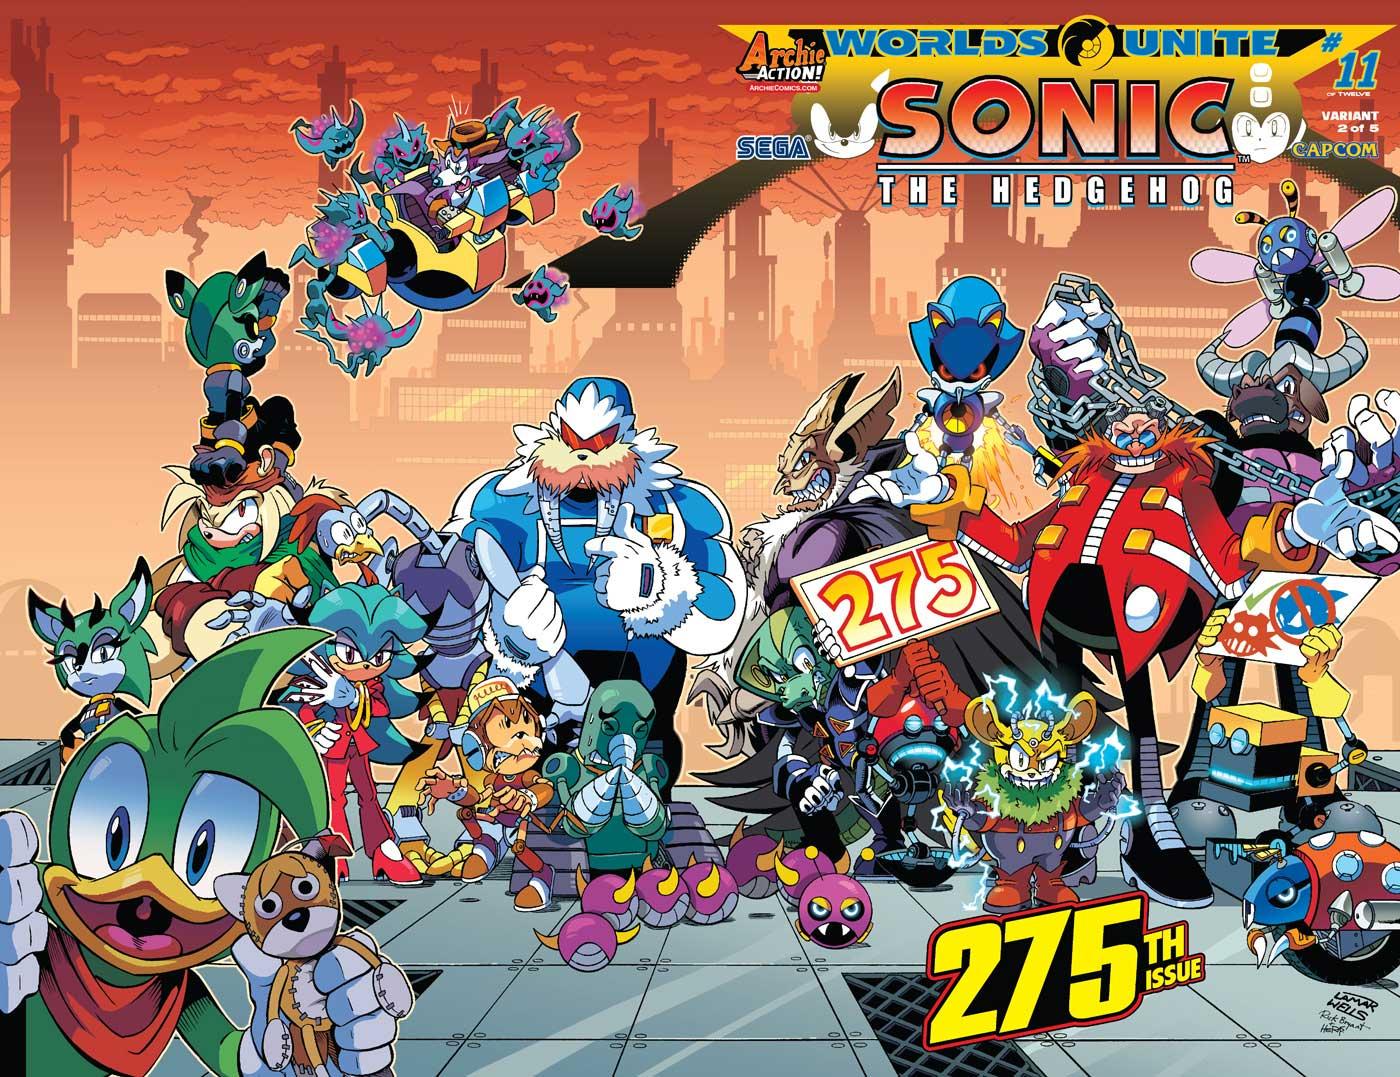 Archie comics archie comics sneak peek of the week major spoilers - Via Archie Comics